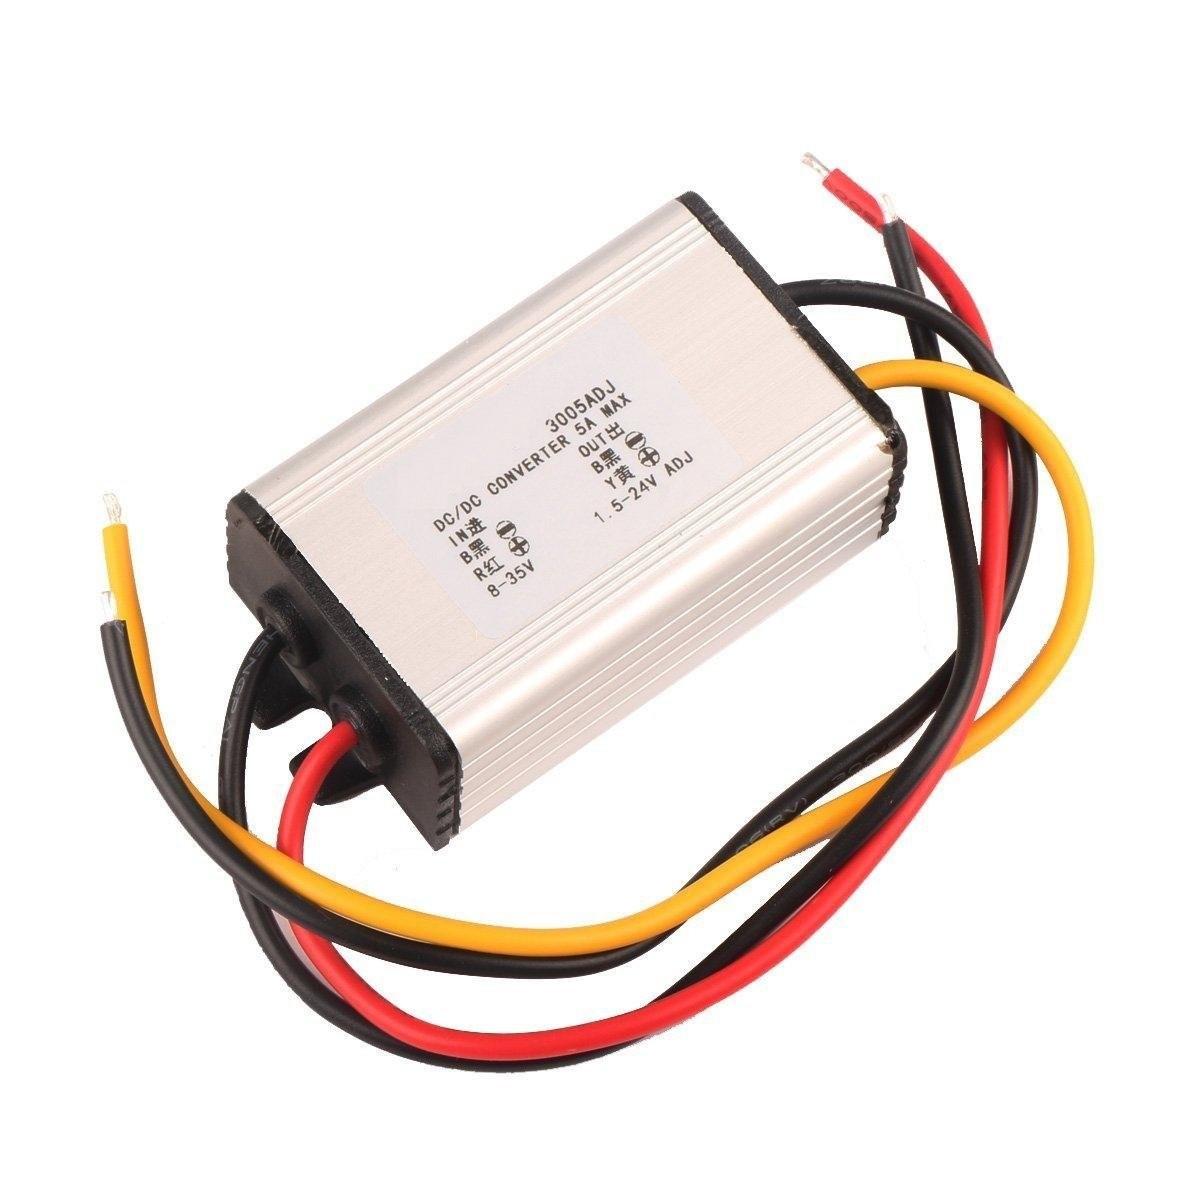 Riorand Dc Volt Converter Regulator 8 35v 24v 12v To 15 5v 12 V Vehicle Wiring Schematic Zoom